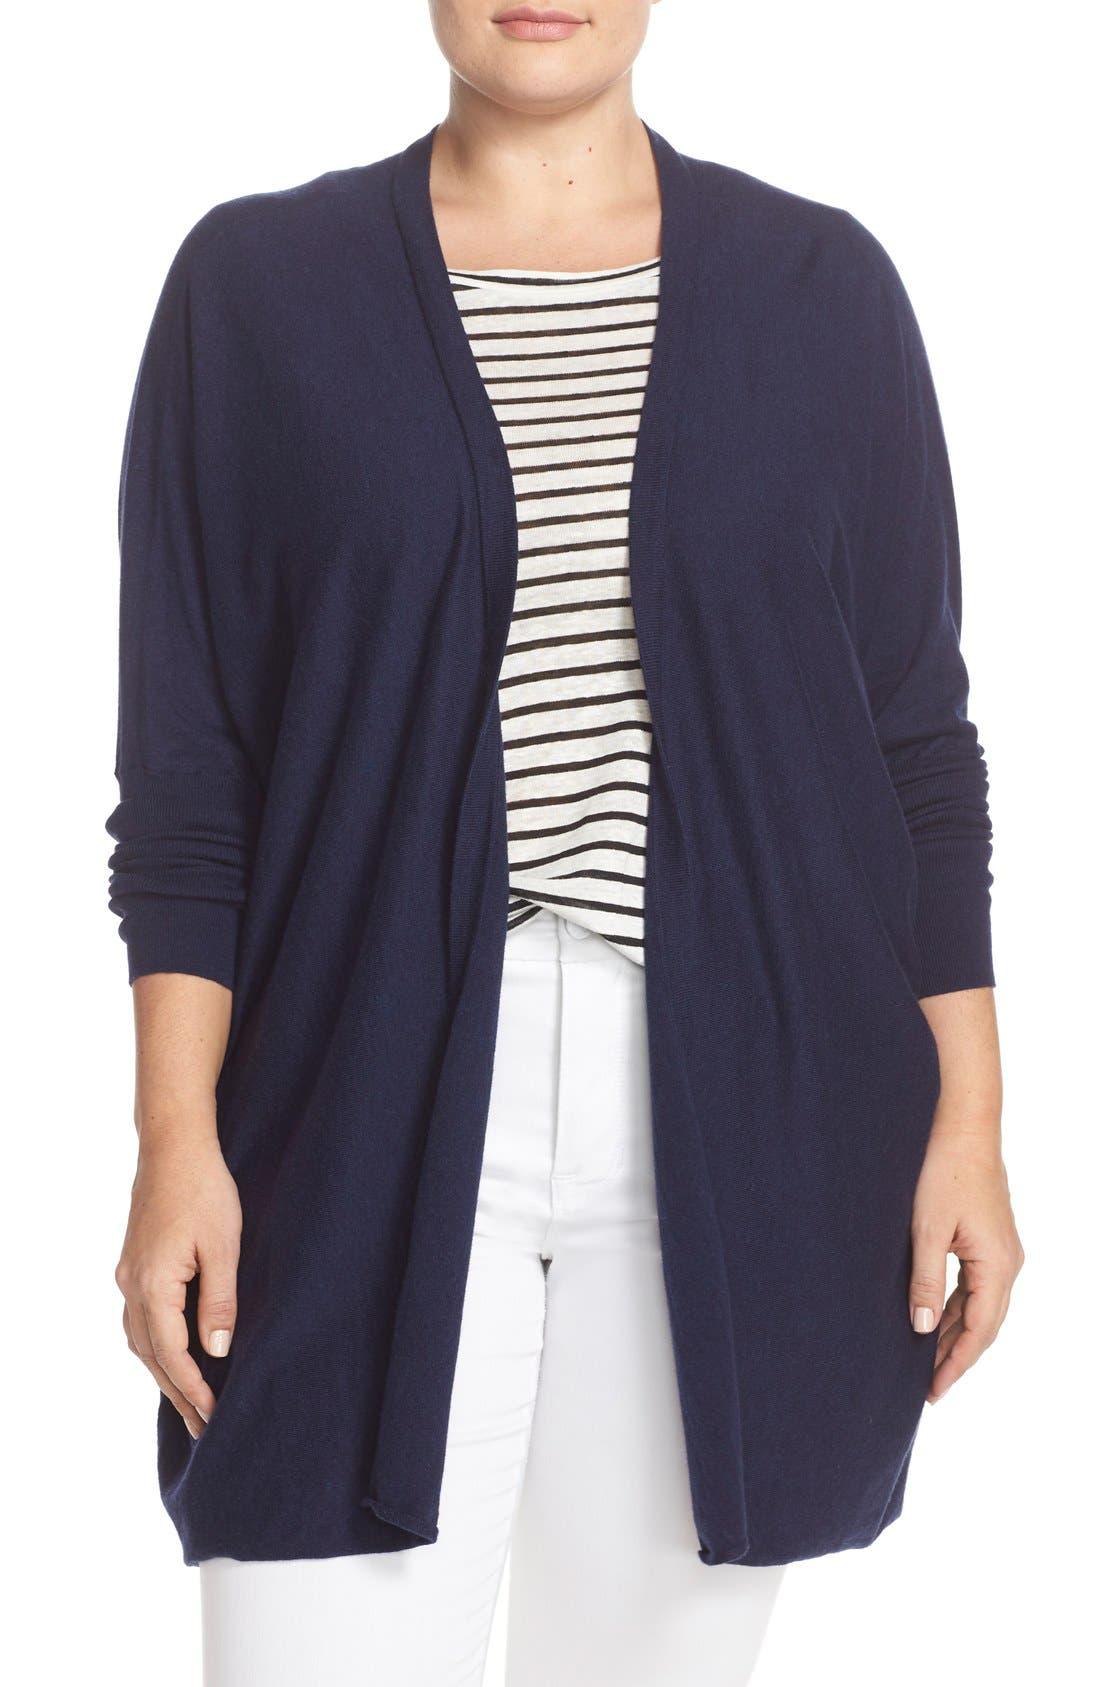 Main Image - Tart 'Darma' Cotton & Cashmere Knit Cardigan (Plus Size)